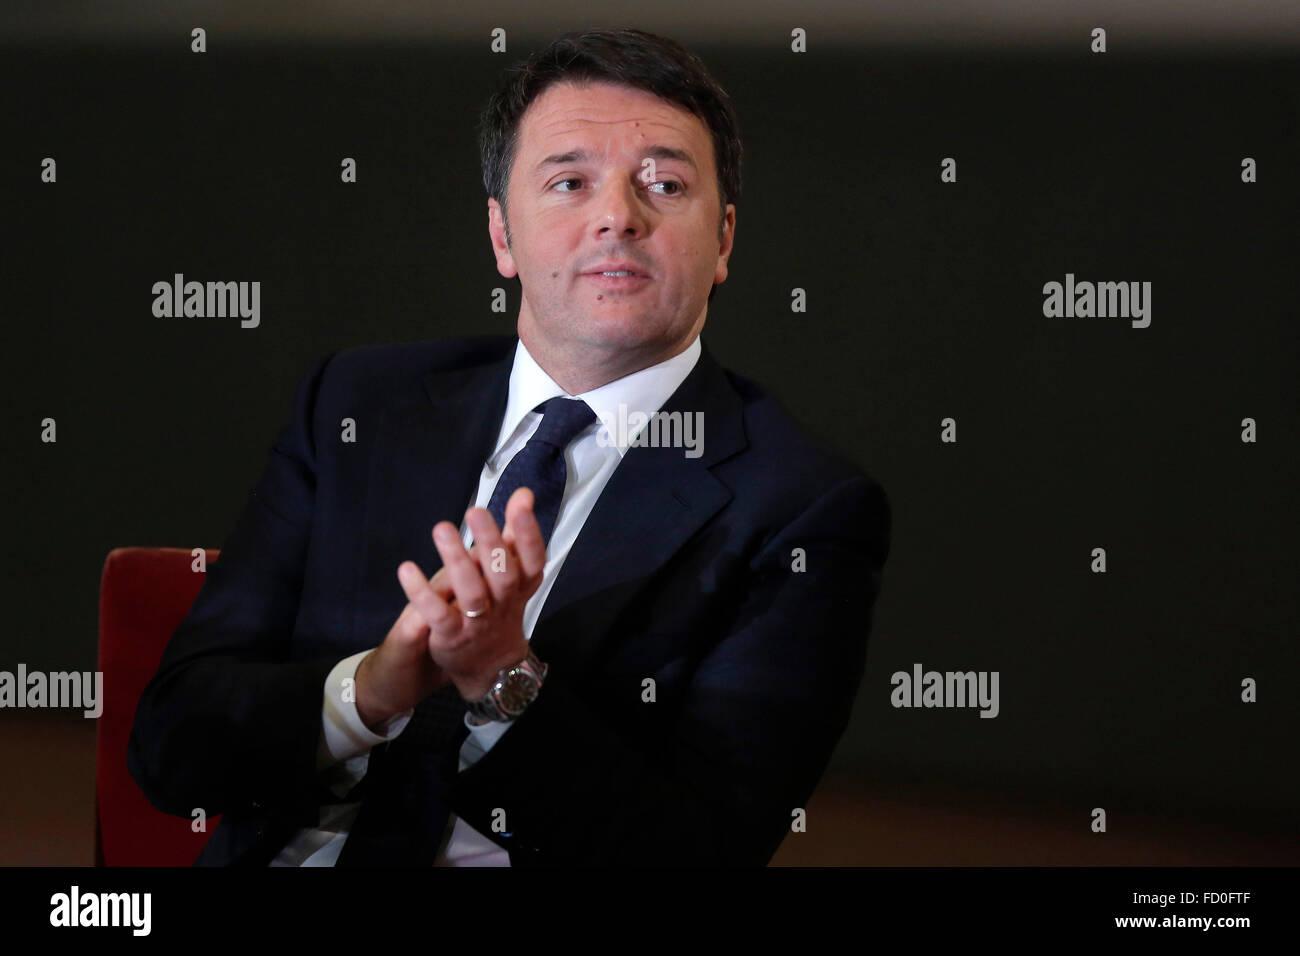 Rome, Italy. 25th January, 2016. Matteo Renzi. Italian Premier meets the President of Iran. Credit:  Insidefoto/Alamy - Stock Image